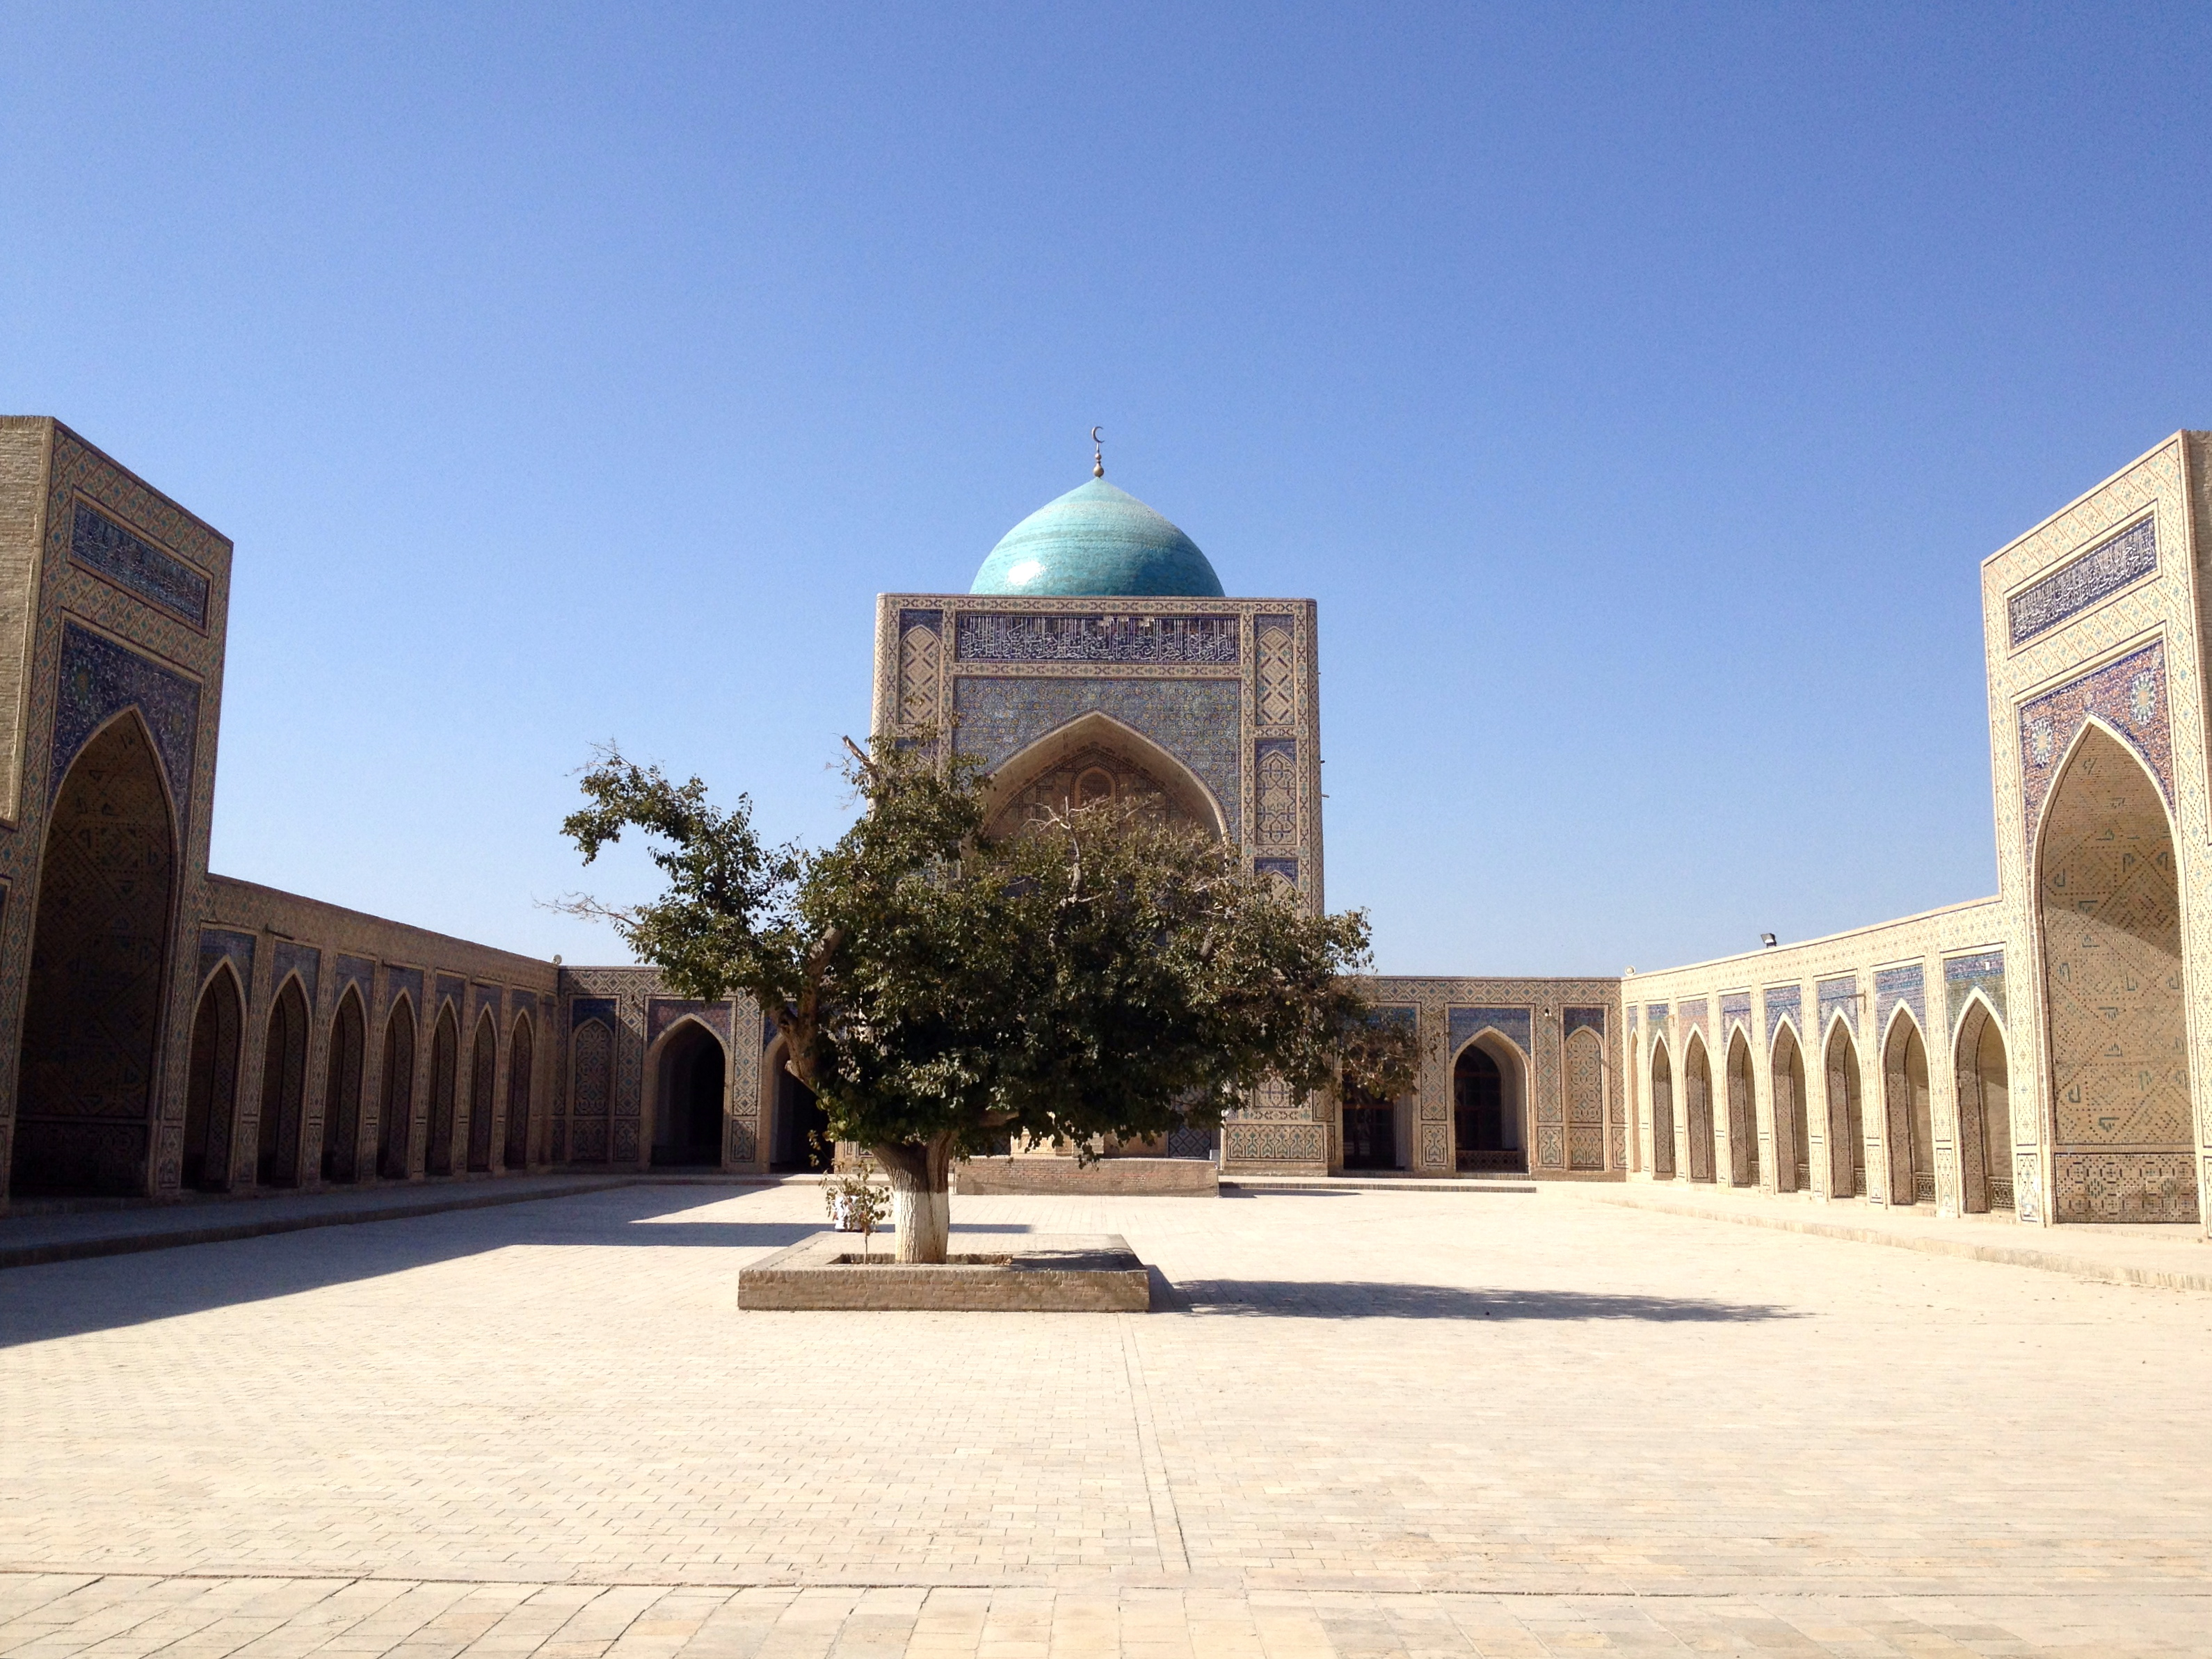 The courtyard of the Kalon Mosque